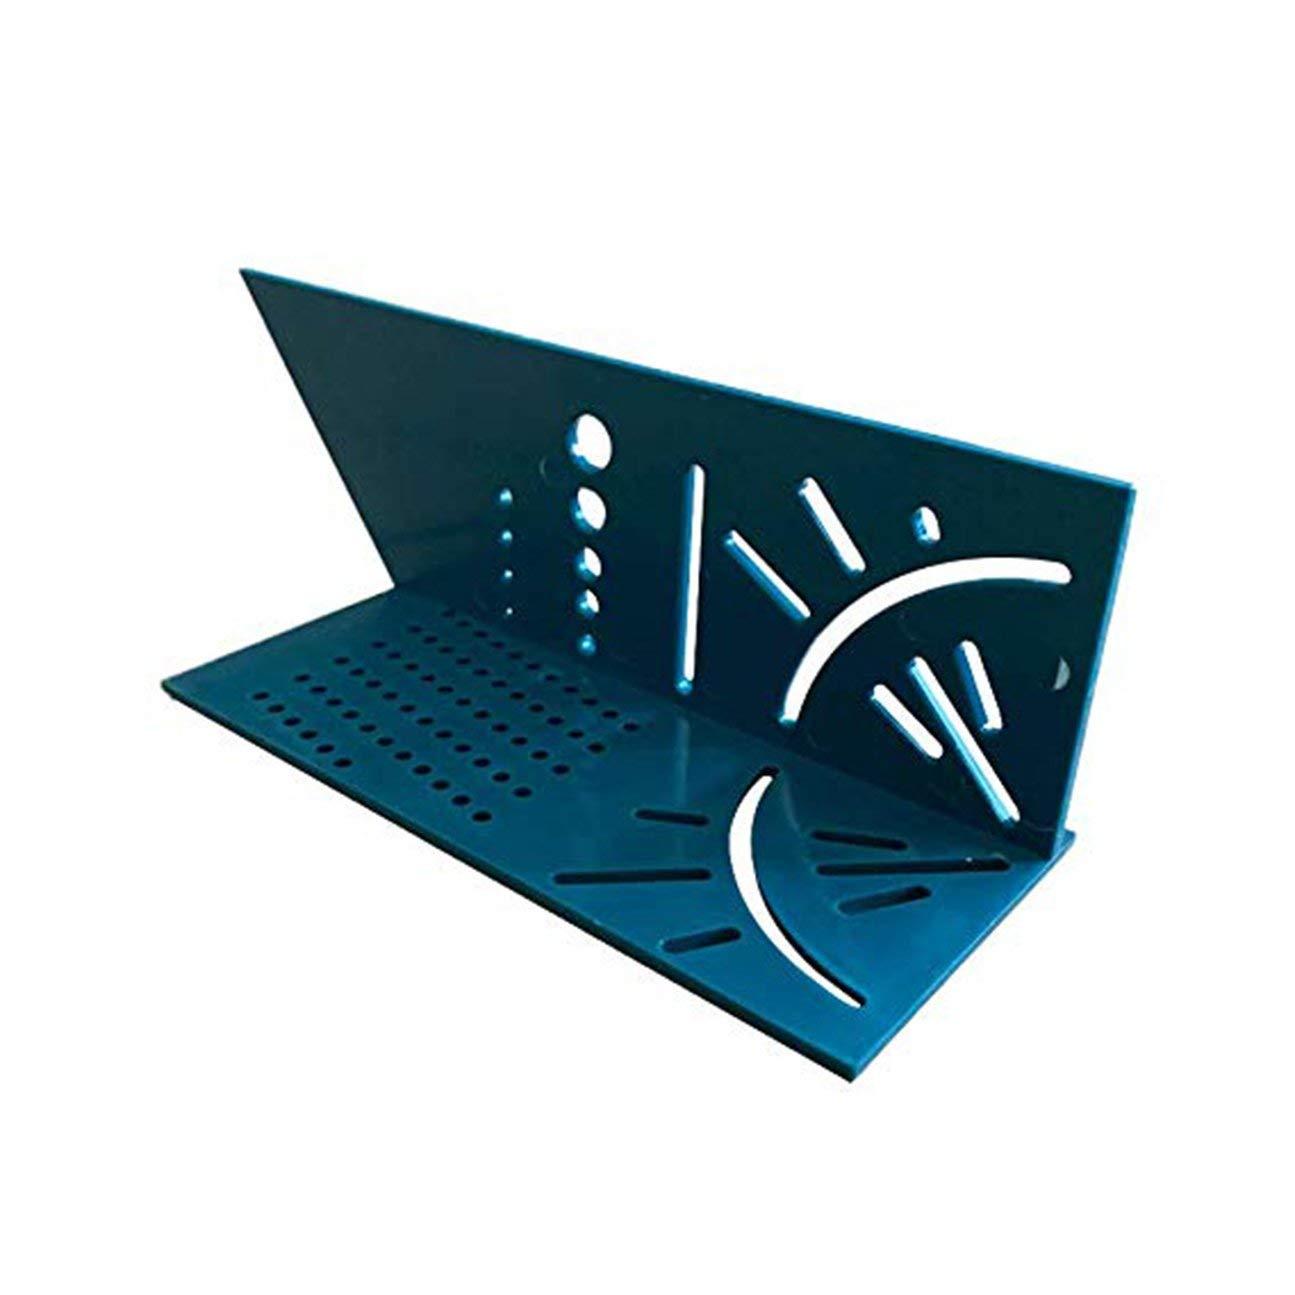 couleur: r/ègle verte MachinYesell MachinYesell Menuiserie 3D Mitre Angle Mesure Carr/é Taille Mesurer Outil Avec Gauge /& Ruler Tools